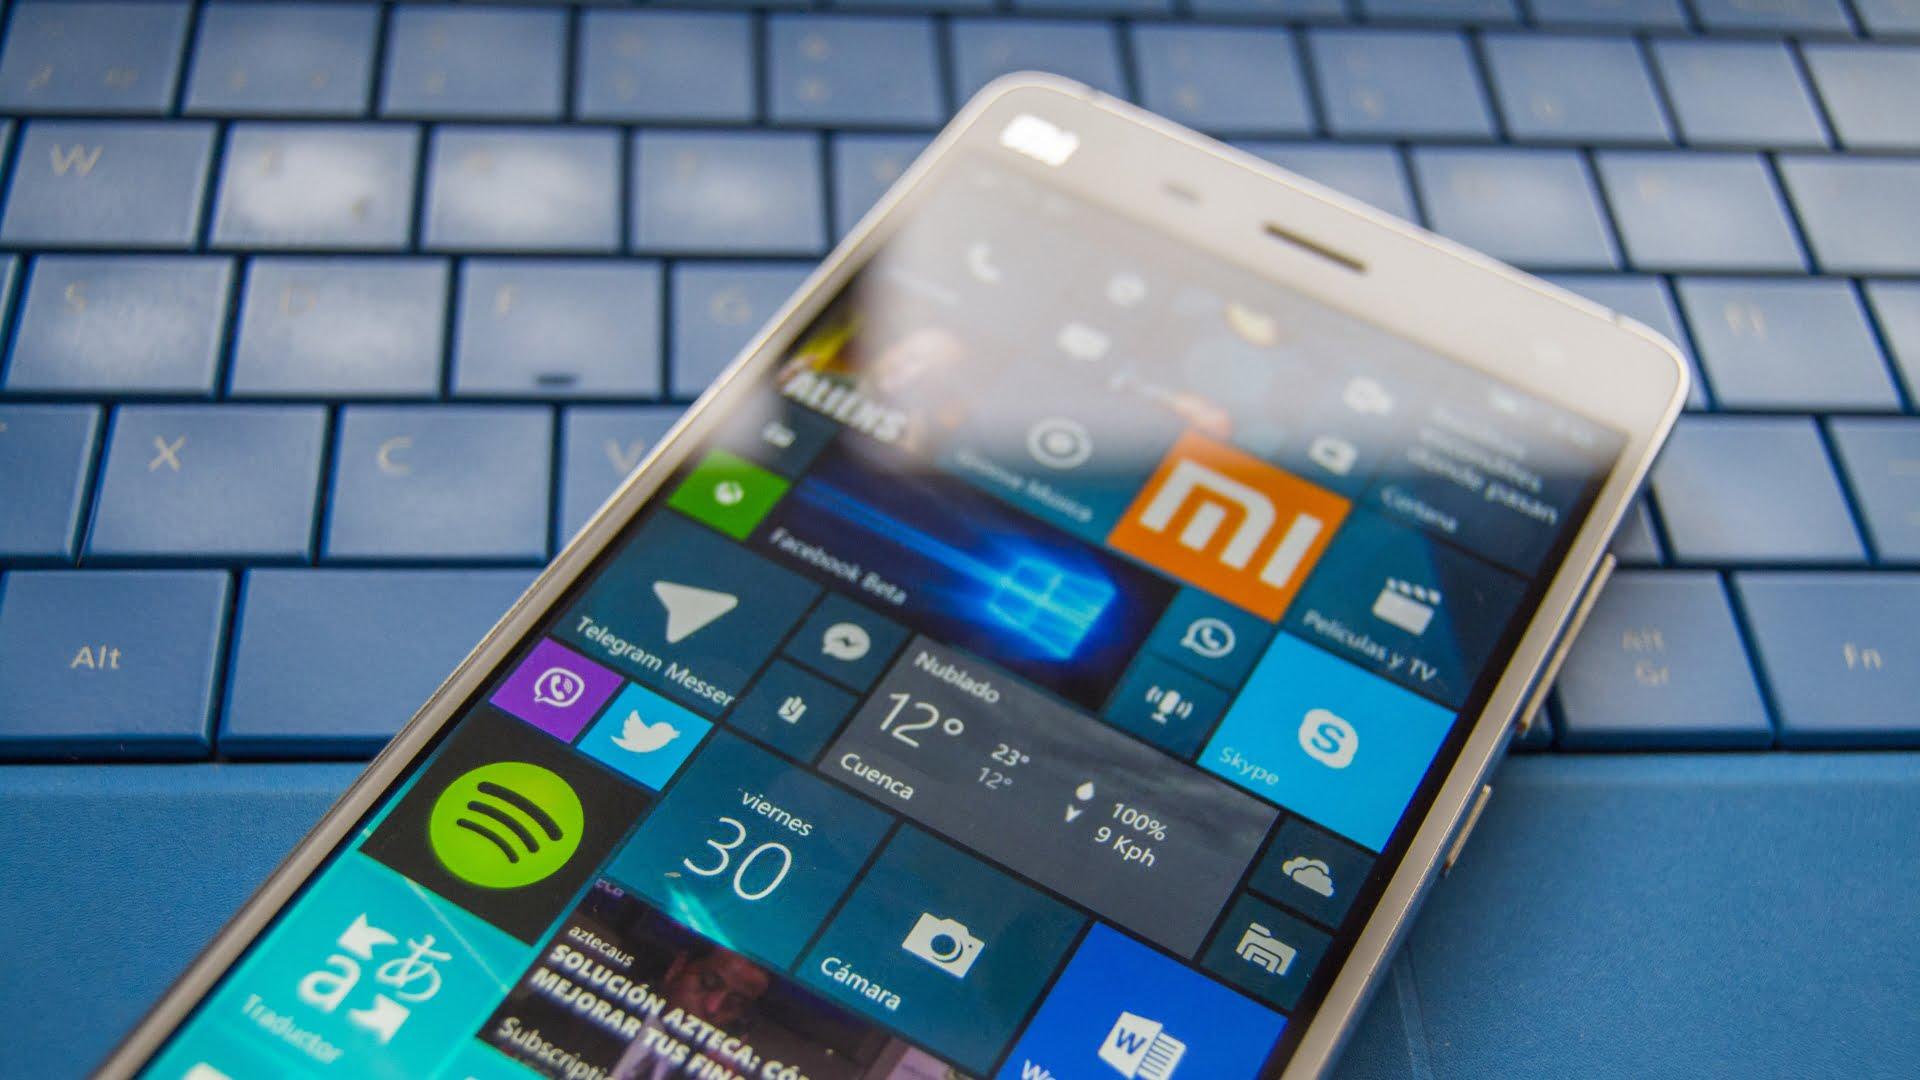 Microsoft planea conquistar Asia con el Xiaomi Mi 4